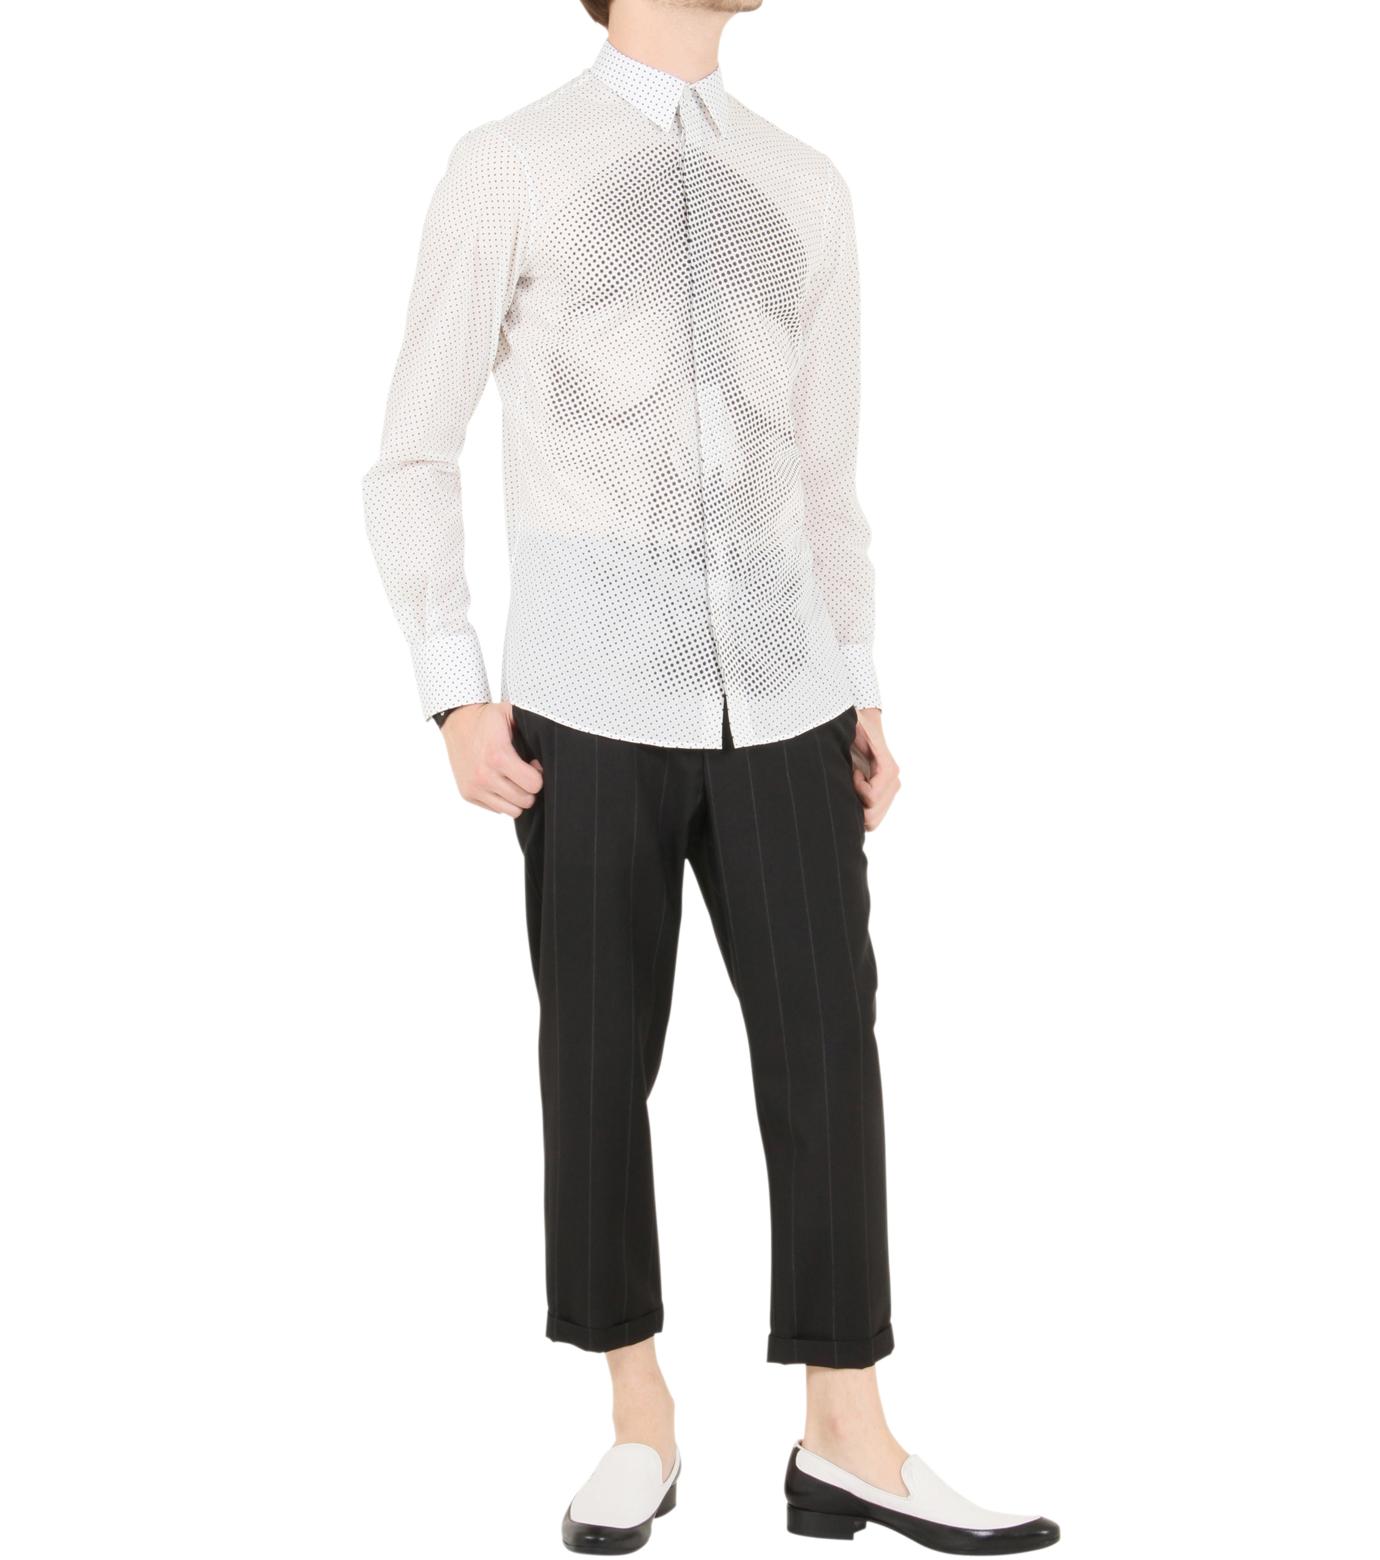 Alexander McQueen(アレキサンダーマックイーン)のSkul dots shirt-WHITE-283024-QW601-4 拡大詳細画像2